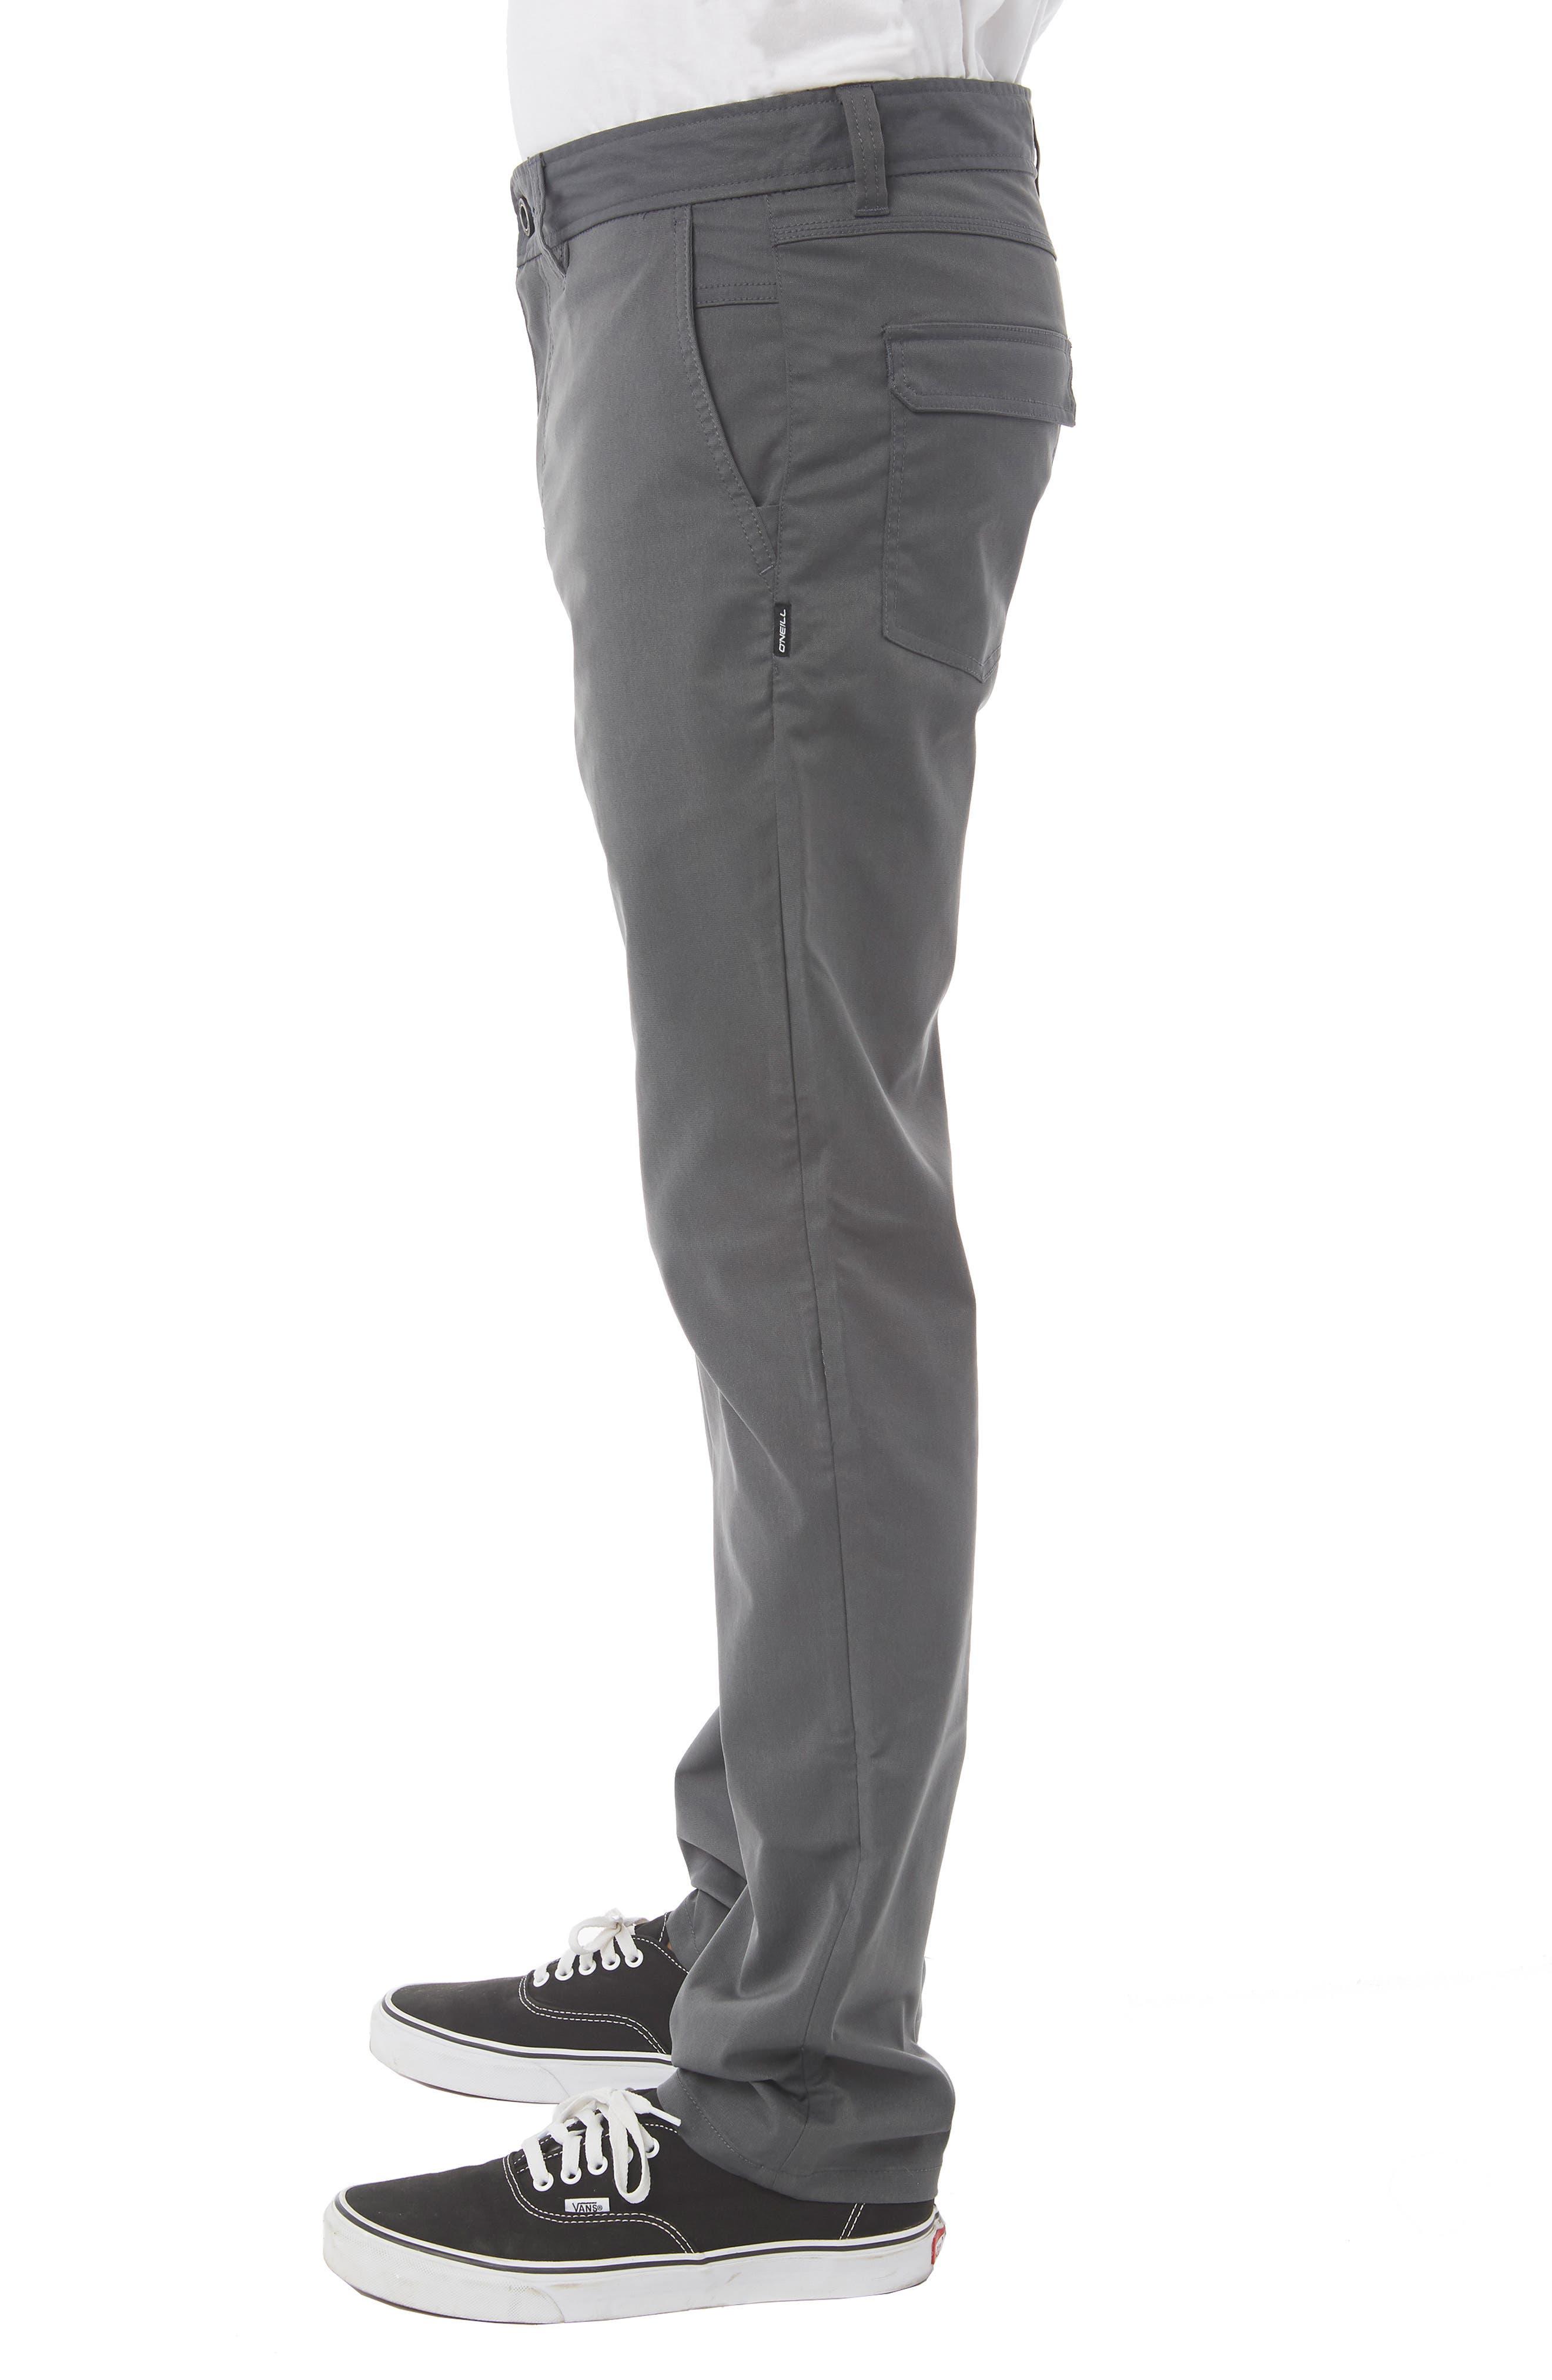 Redlands Hybrid Performance Pants,                             Alternate thumbnail 3, color,                             DARK FATIGUE